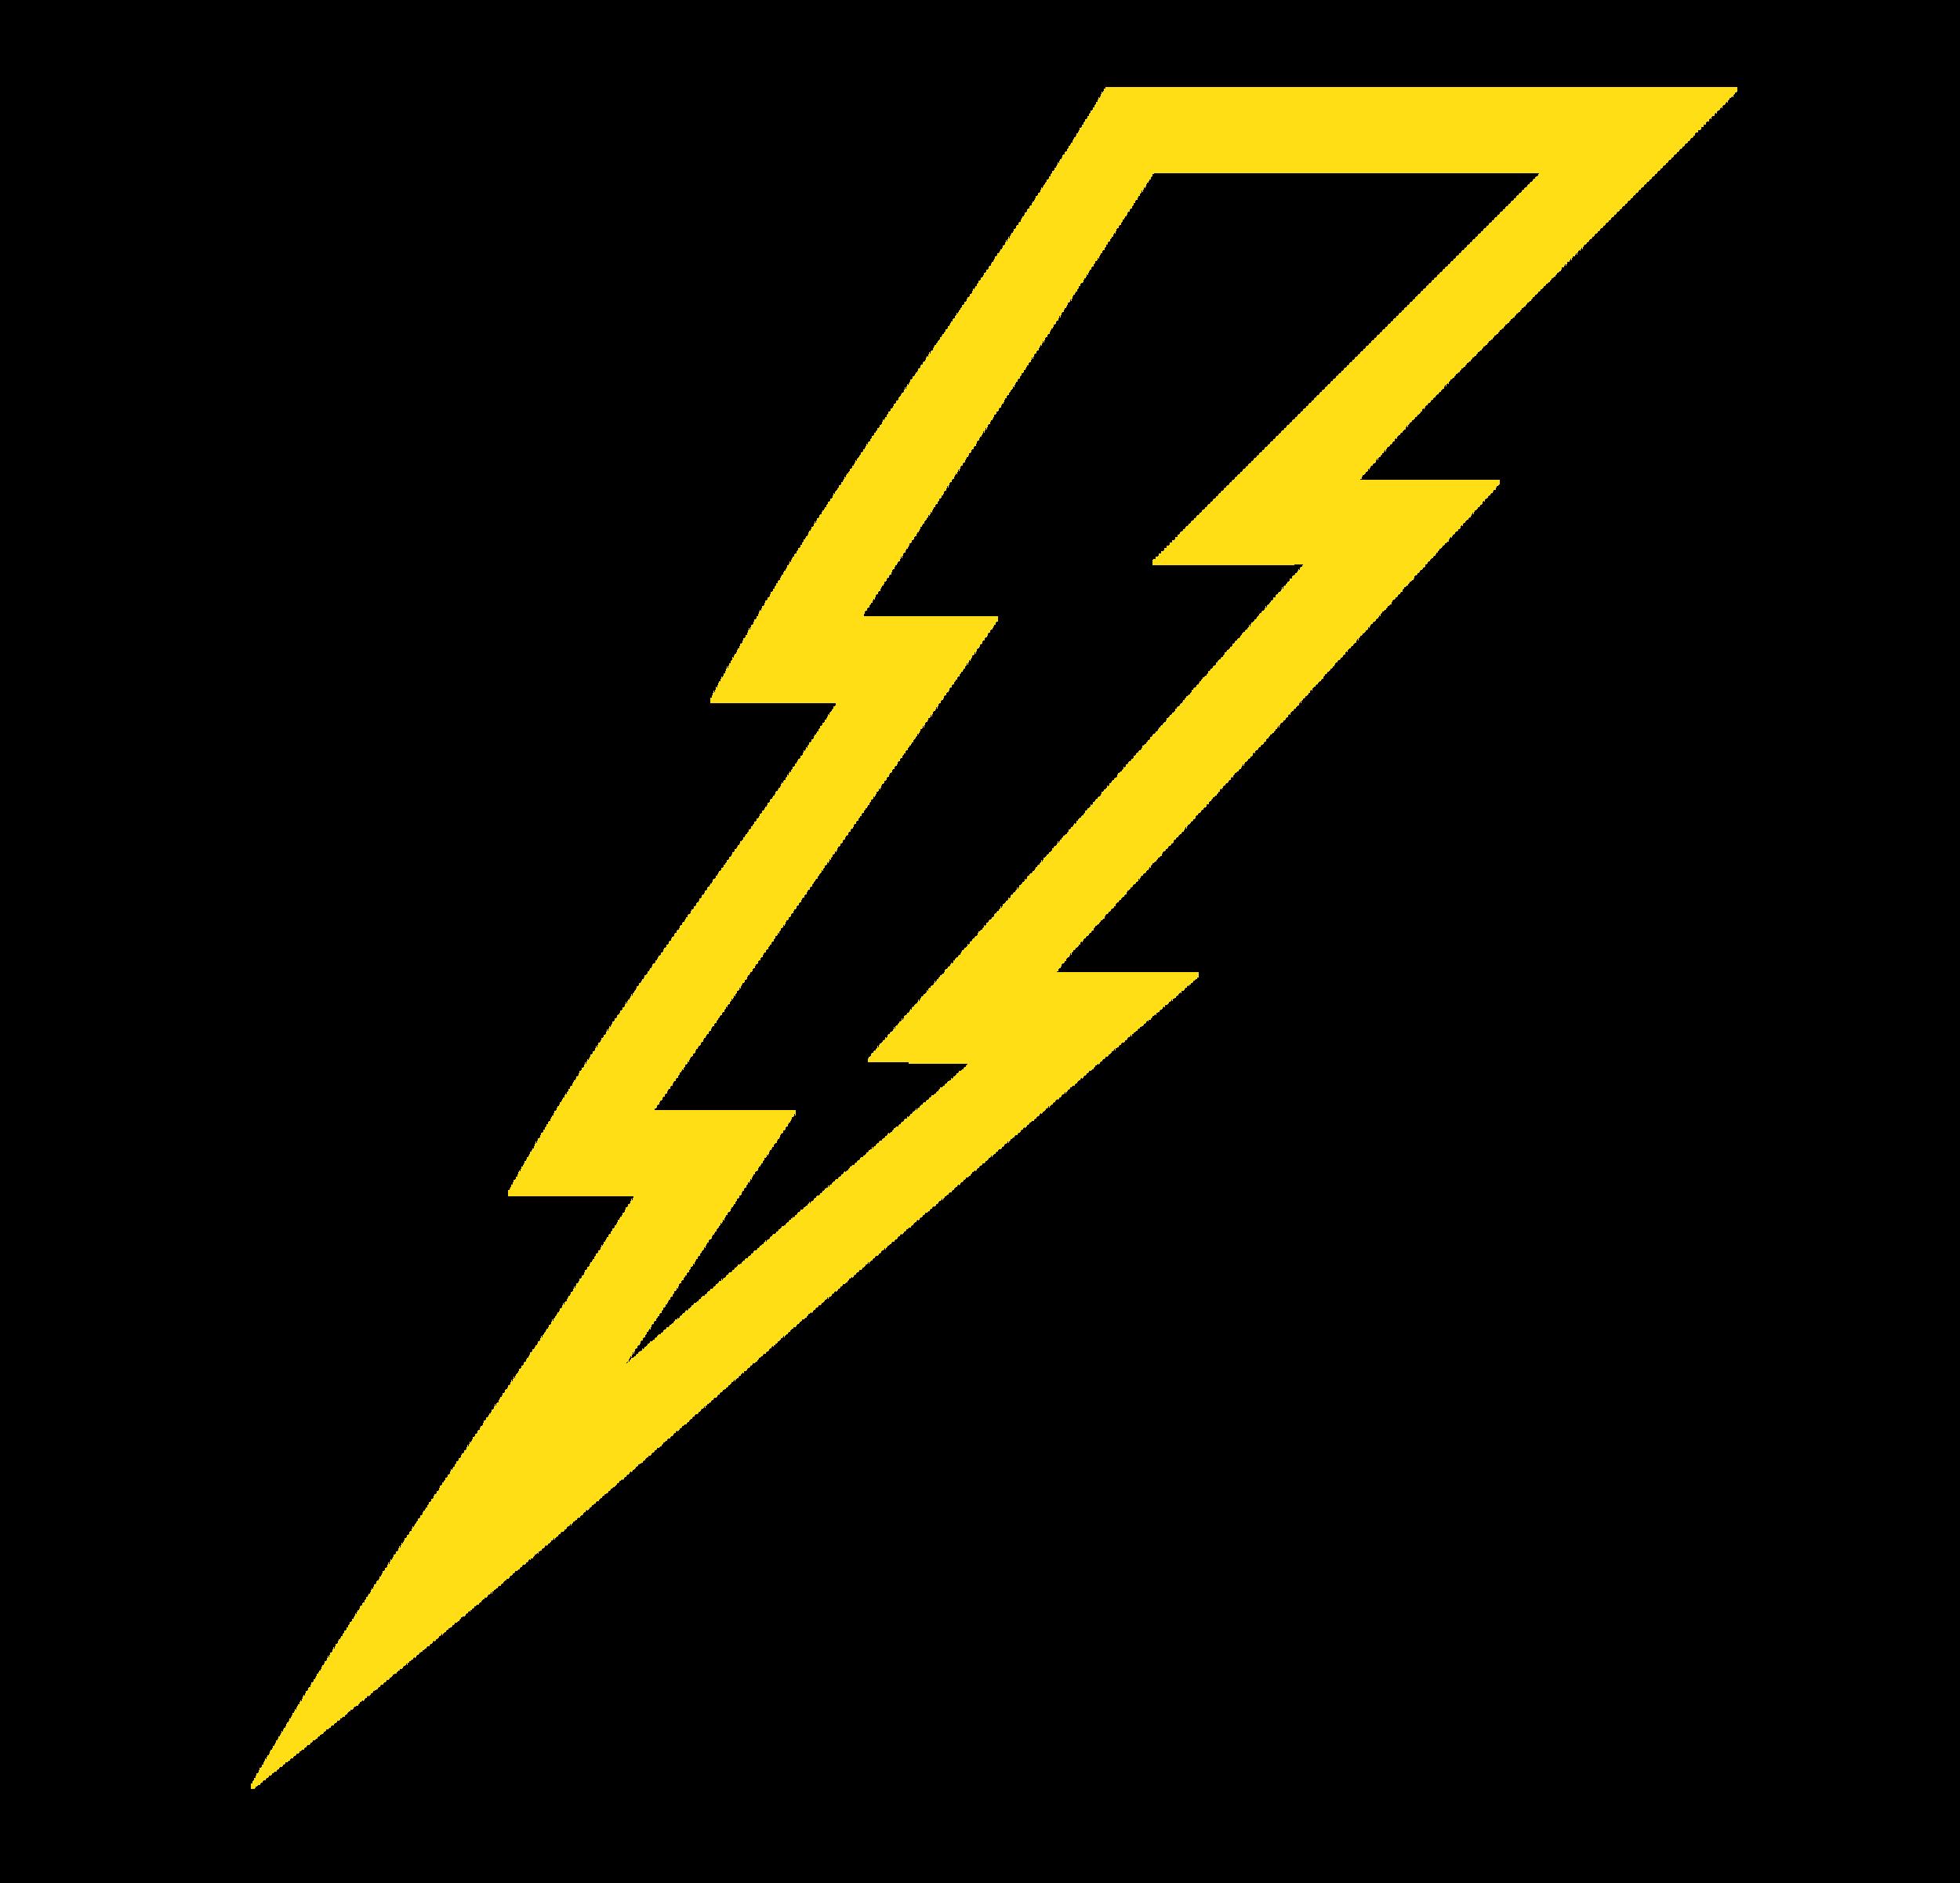 2500x2402 Lightning Bolt Bolt Clipart 7 Lighting Bolt French Bathroom